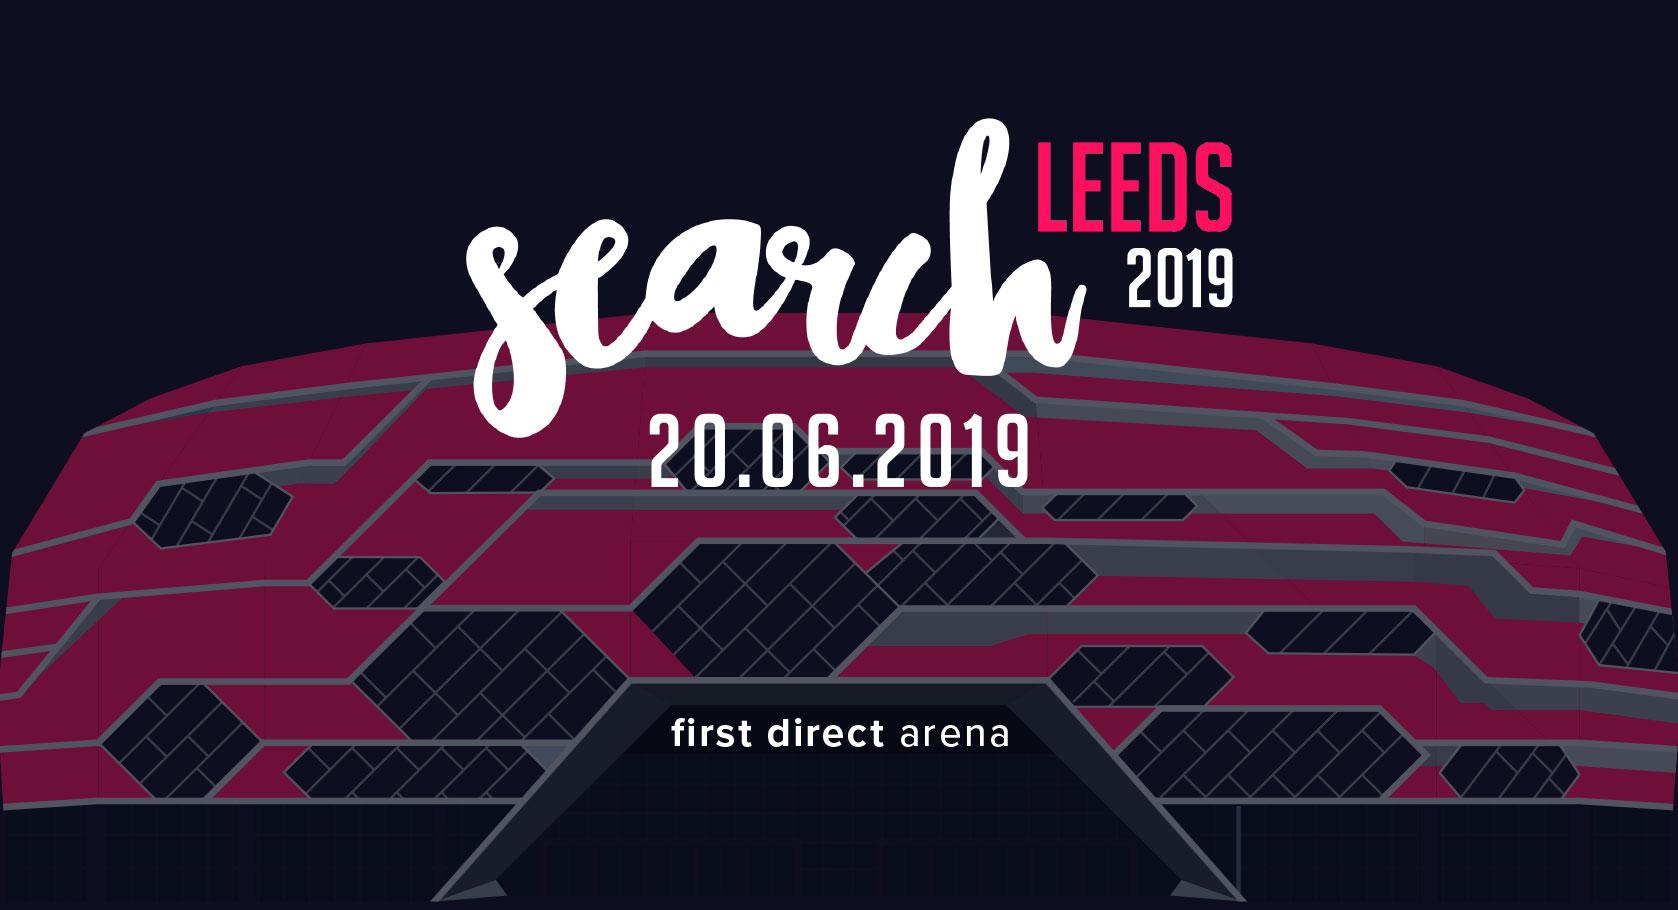 Search Leeds Image